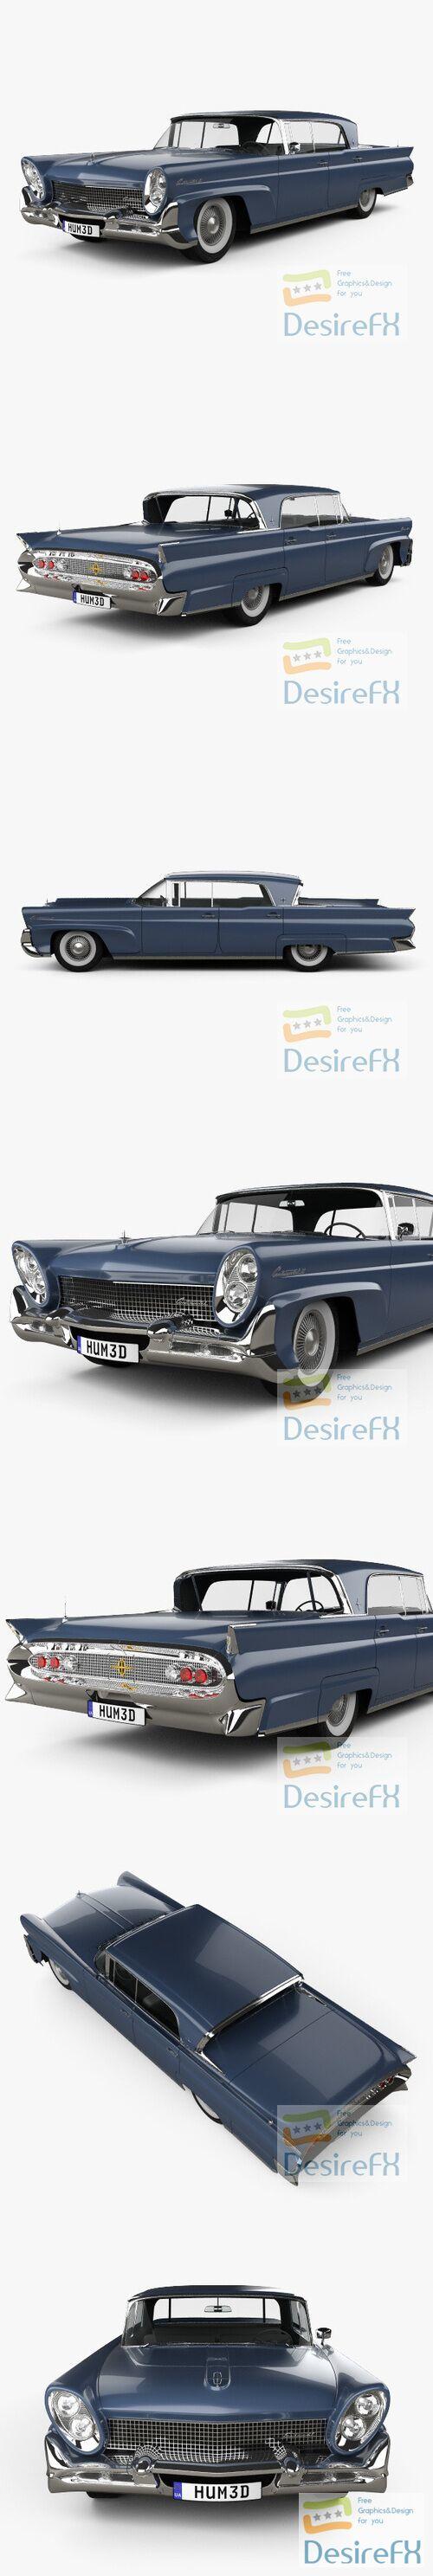 Lincoln Continental Mark III Landau 1958 3D Model